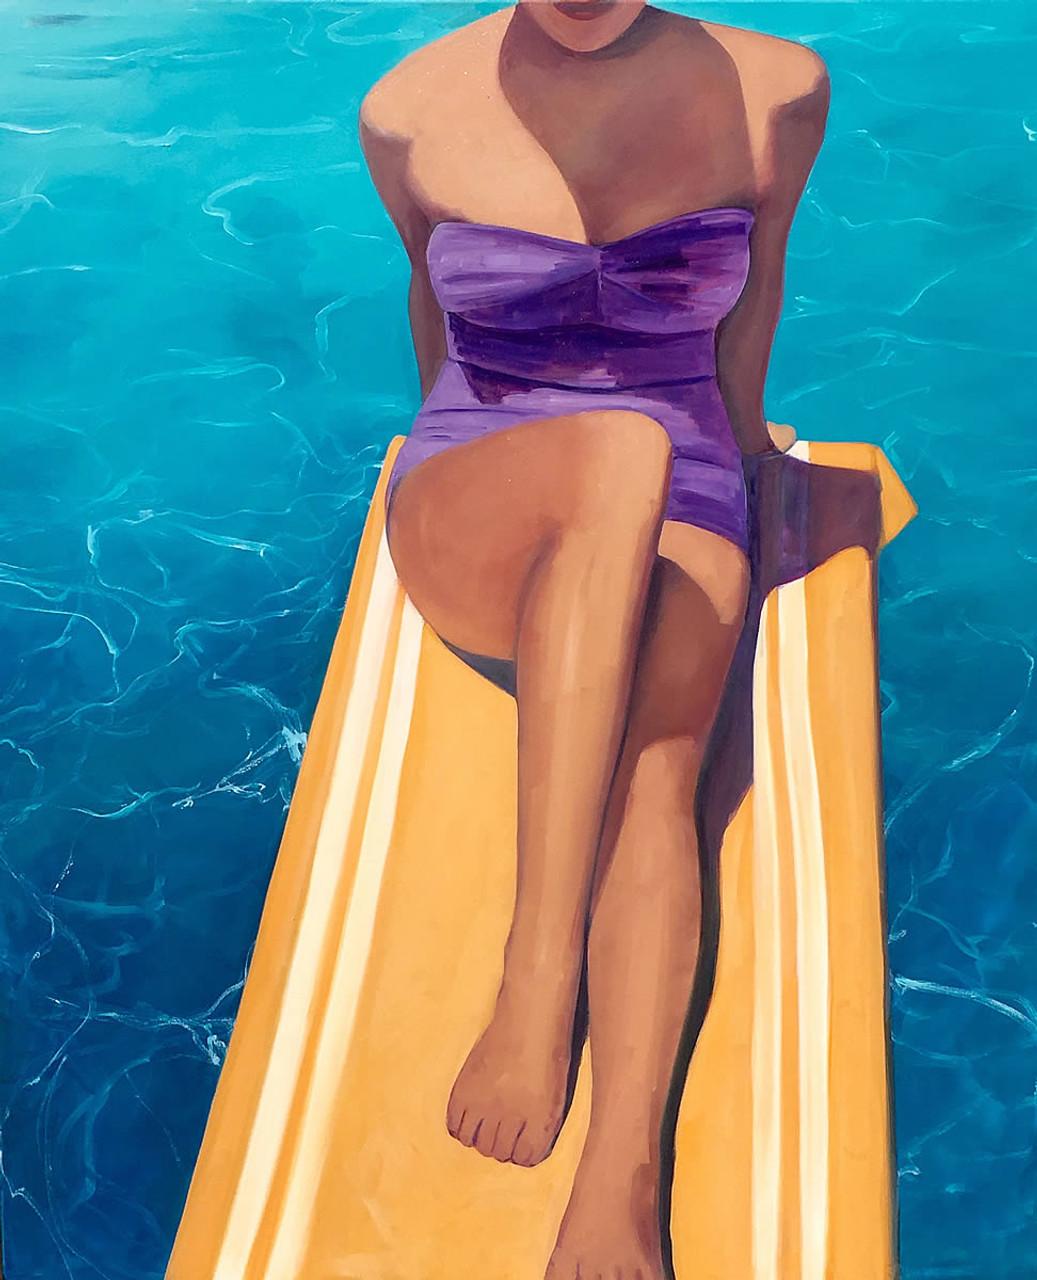 Diving Board Girl